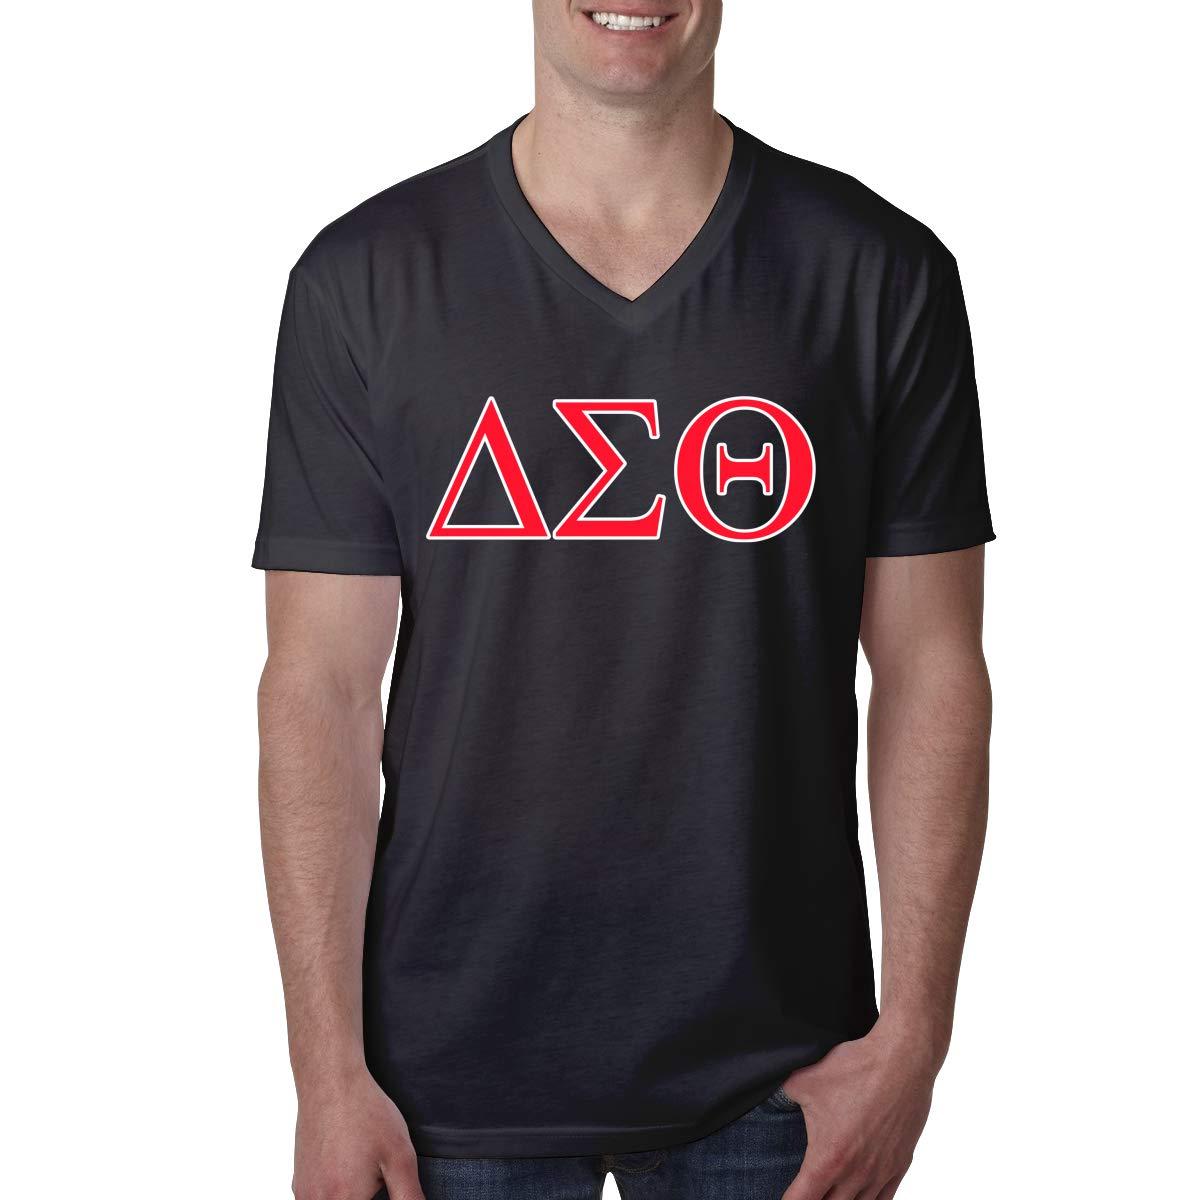 Delta Sigma Theta Sorority S T-Shirt Adult Short Sleeve V Neck T Shirts Hipster Top S-XXL